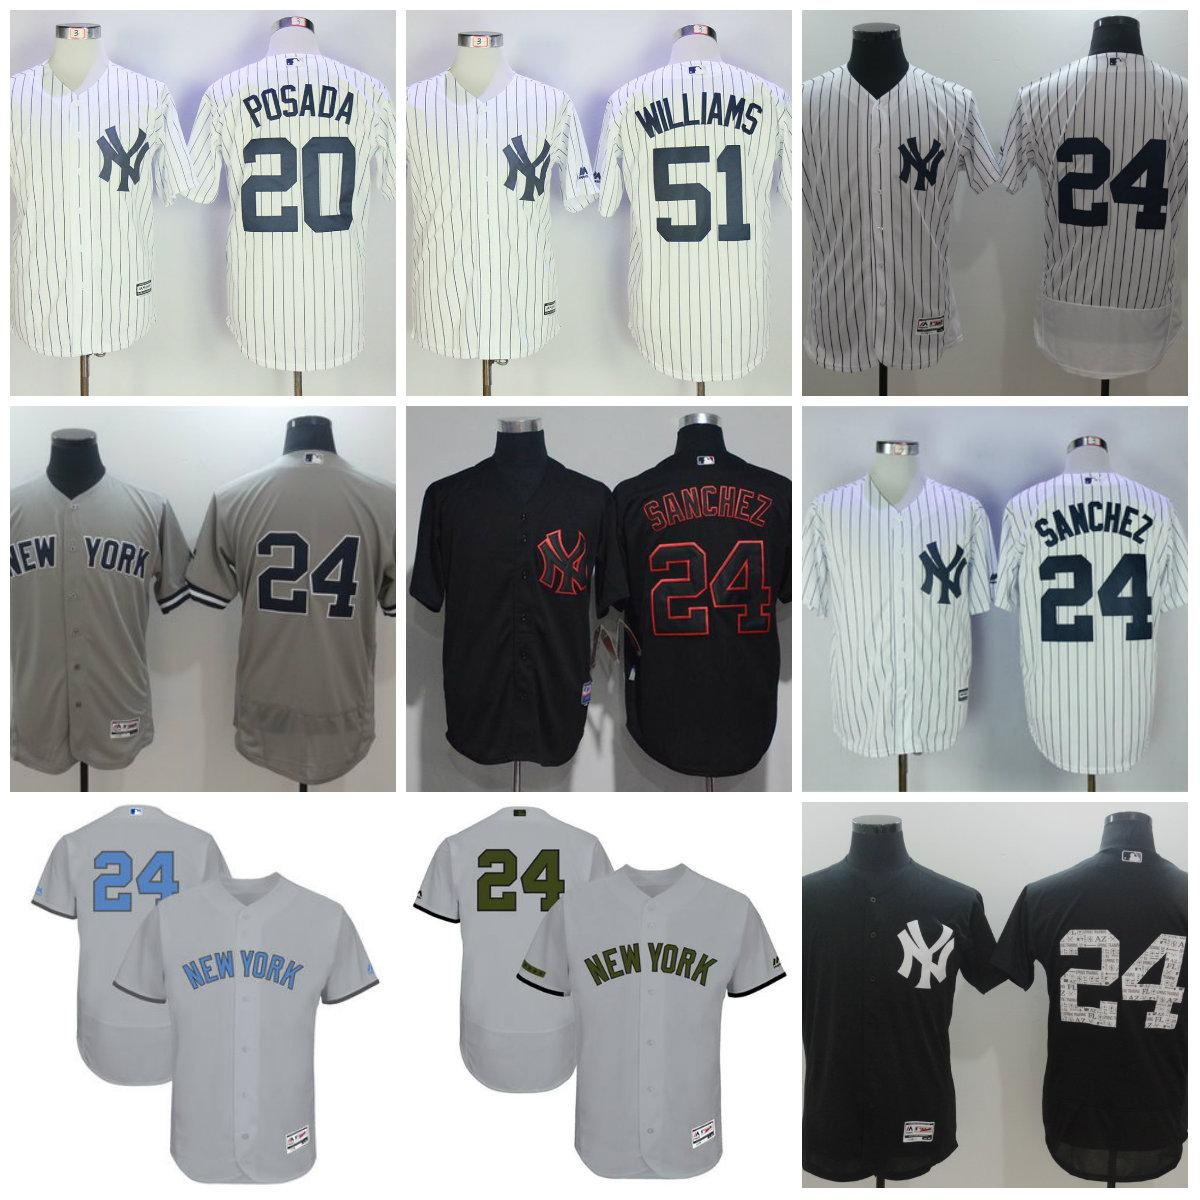 69abfd97d ... 2017 MenS New York Yankees 24 Gary Sanchez Jersey 51 Bernie Williams  Jorge Posada White Navy